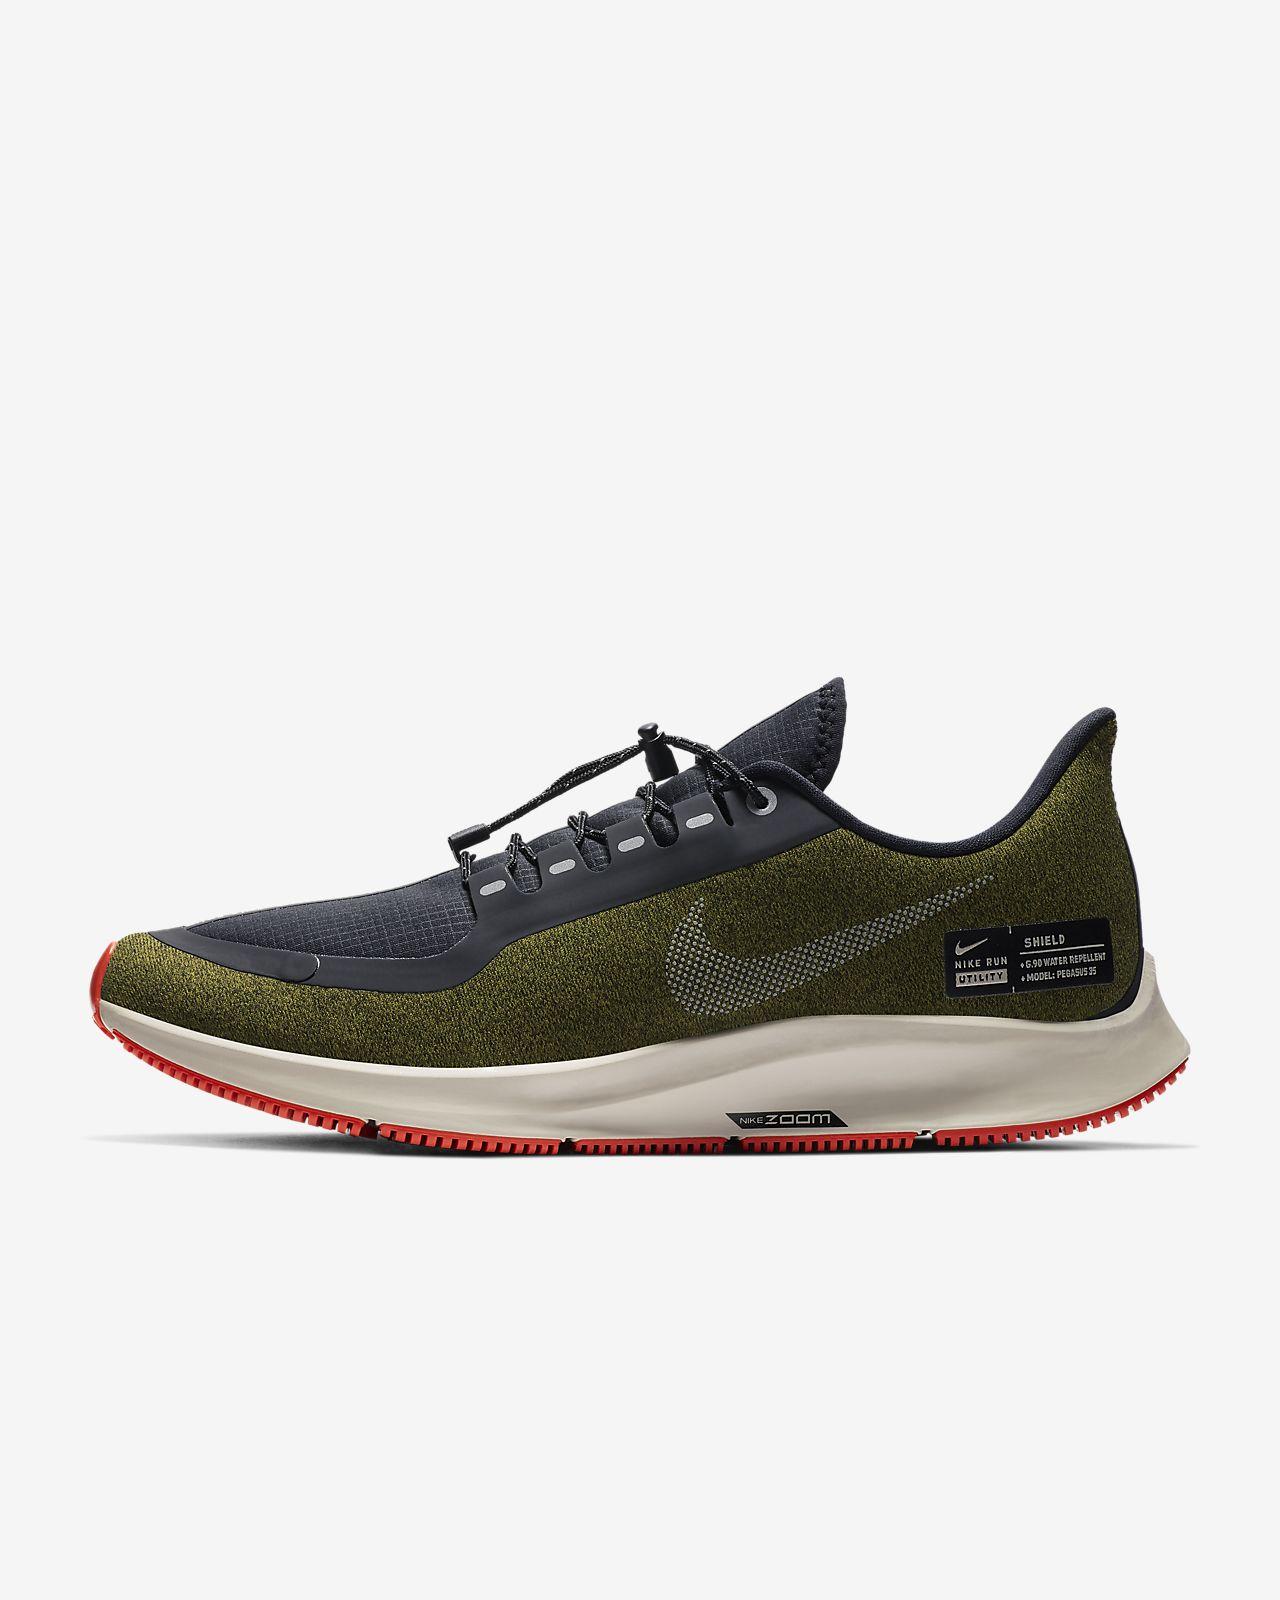 free shipping 9cc47 a7147 ... Löparsko Nike Air Zoom Pegasus 35 Shield Water-Repellent för män